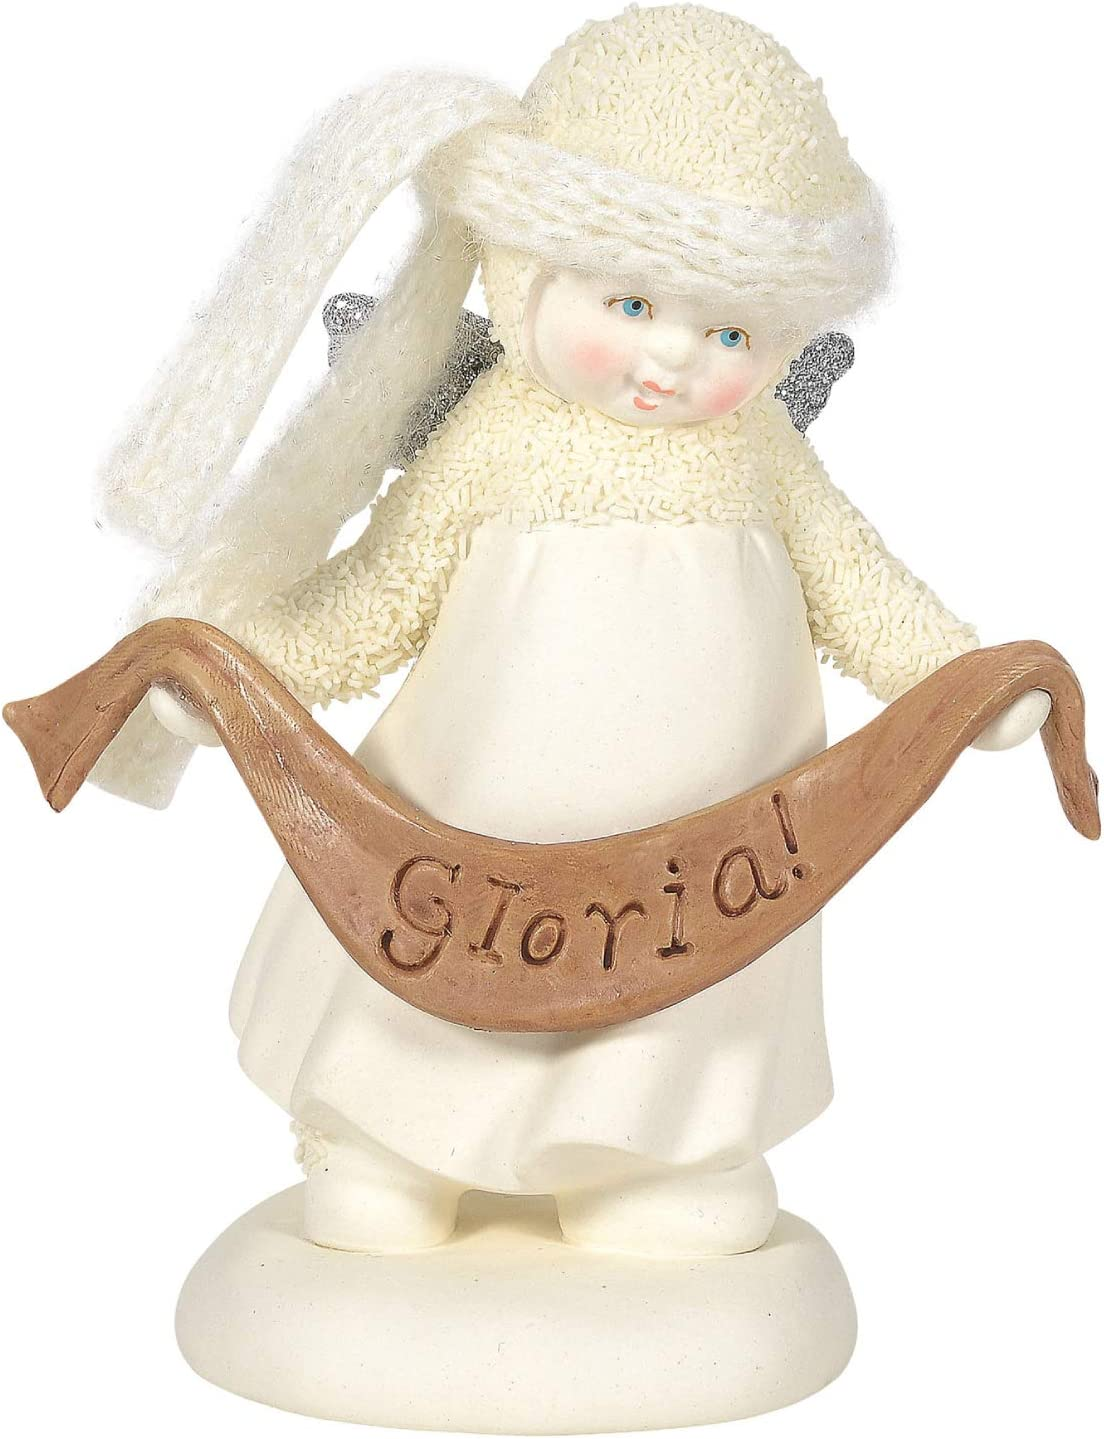 Dept 56 Snowbabies Peaceful Kingdom 2019 WE ARE THE CHILDREN Snowbaby 6003500